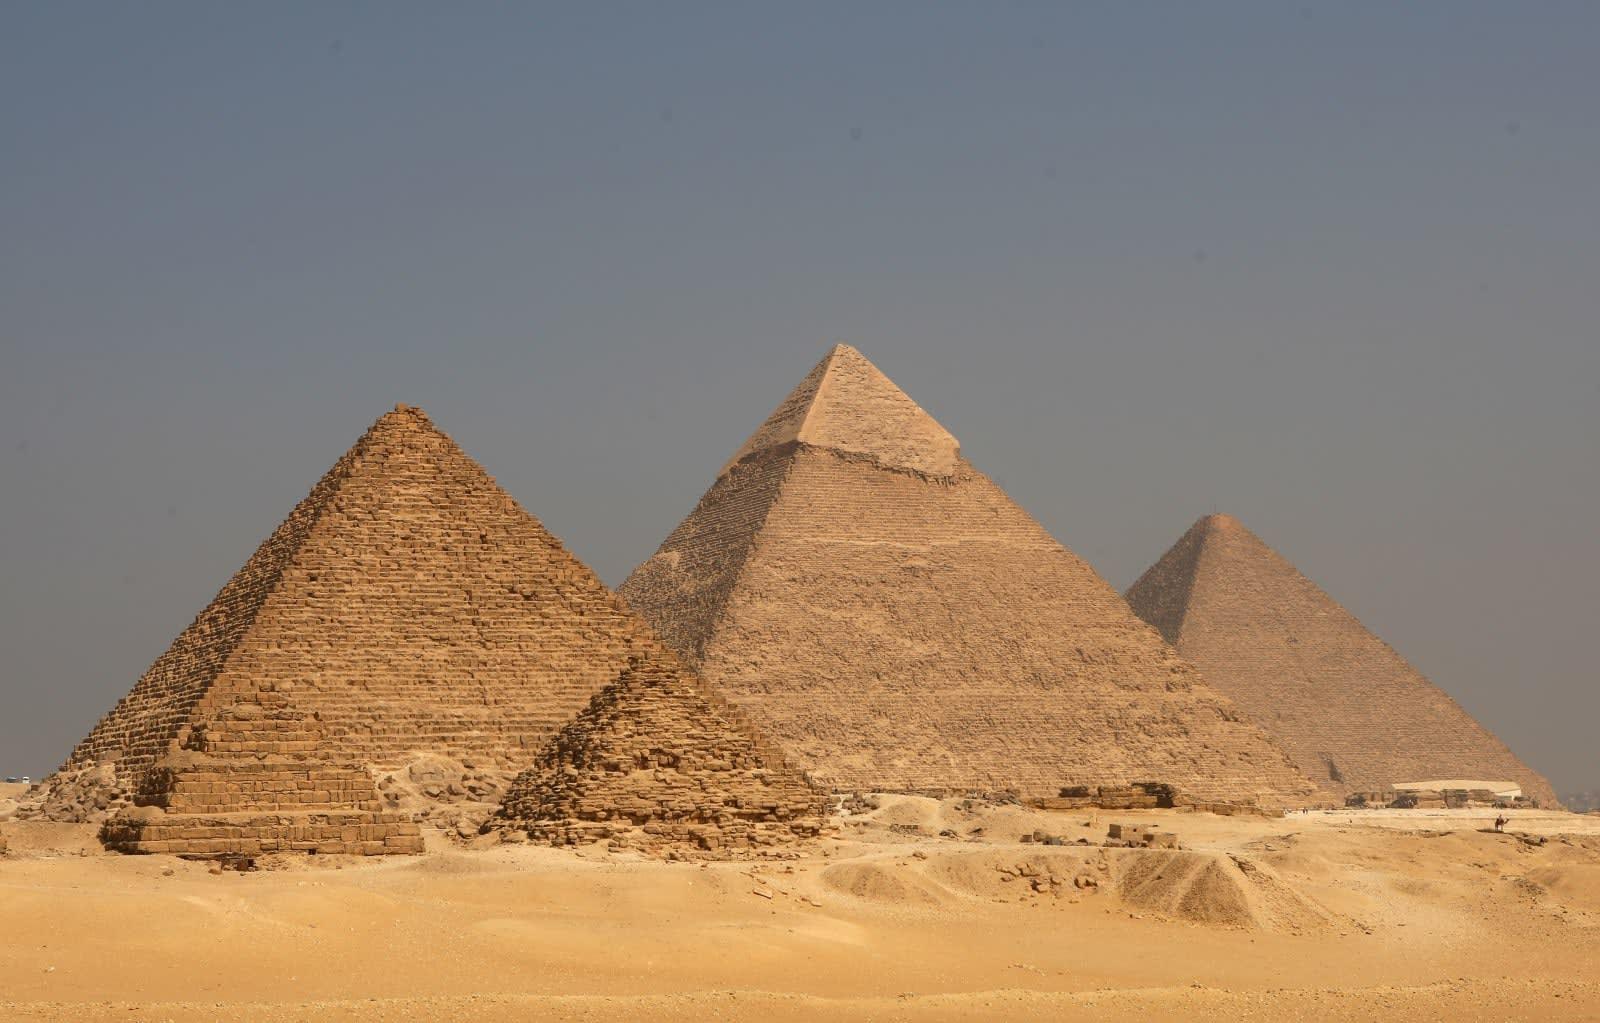 Cosmic rays unlock new secrets in Egypt's Great Pyramid